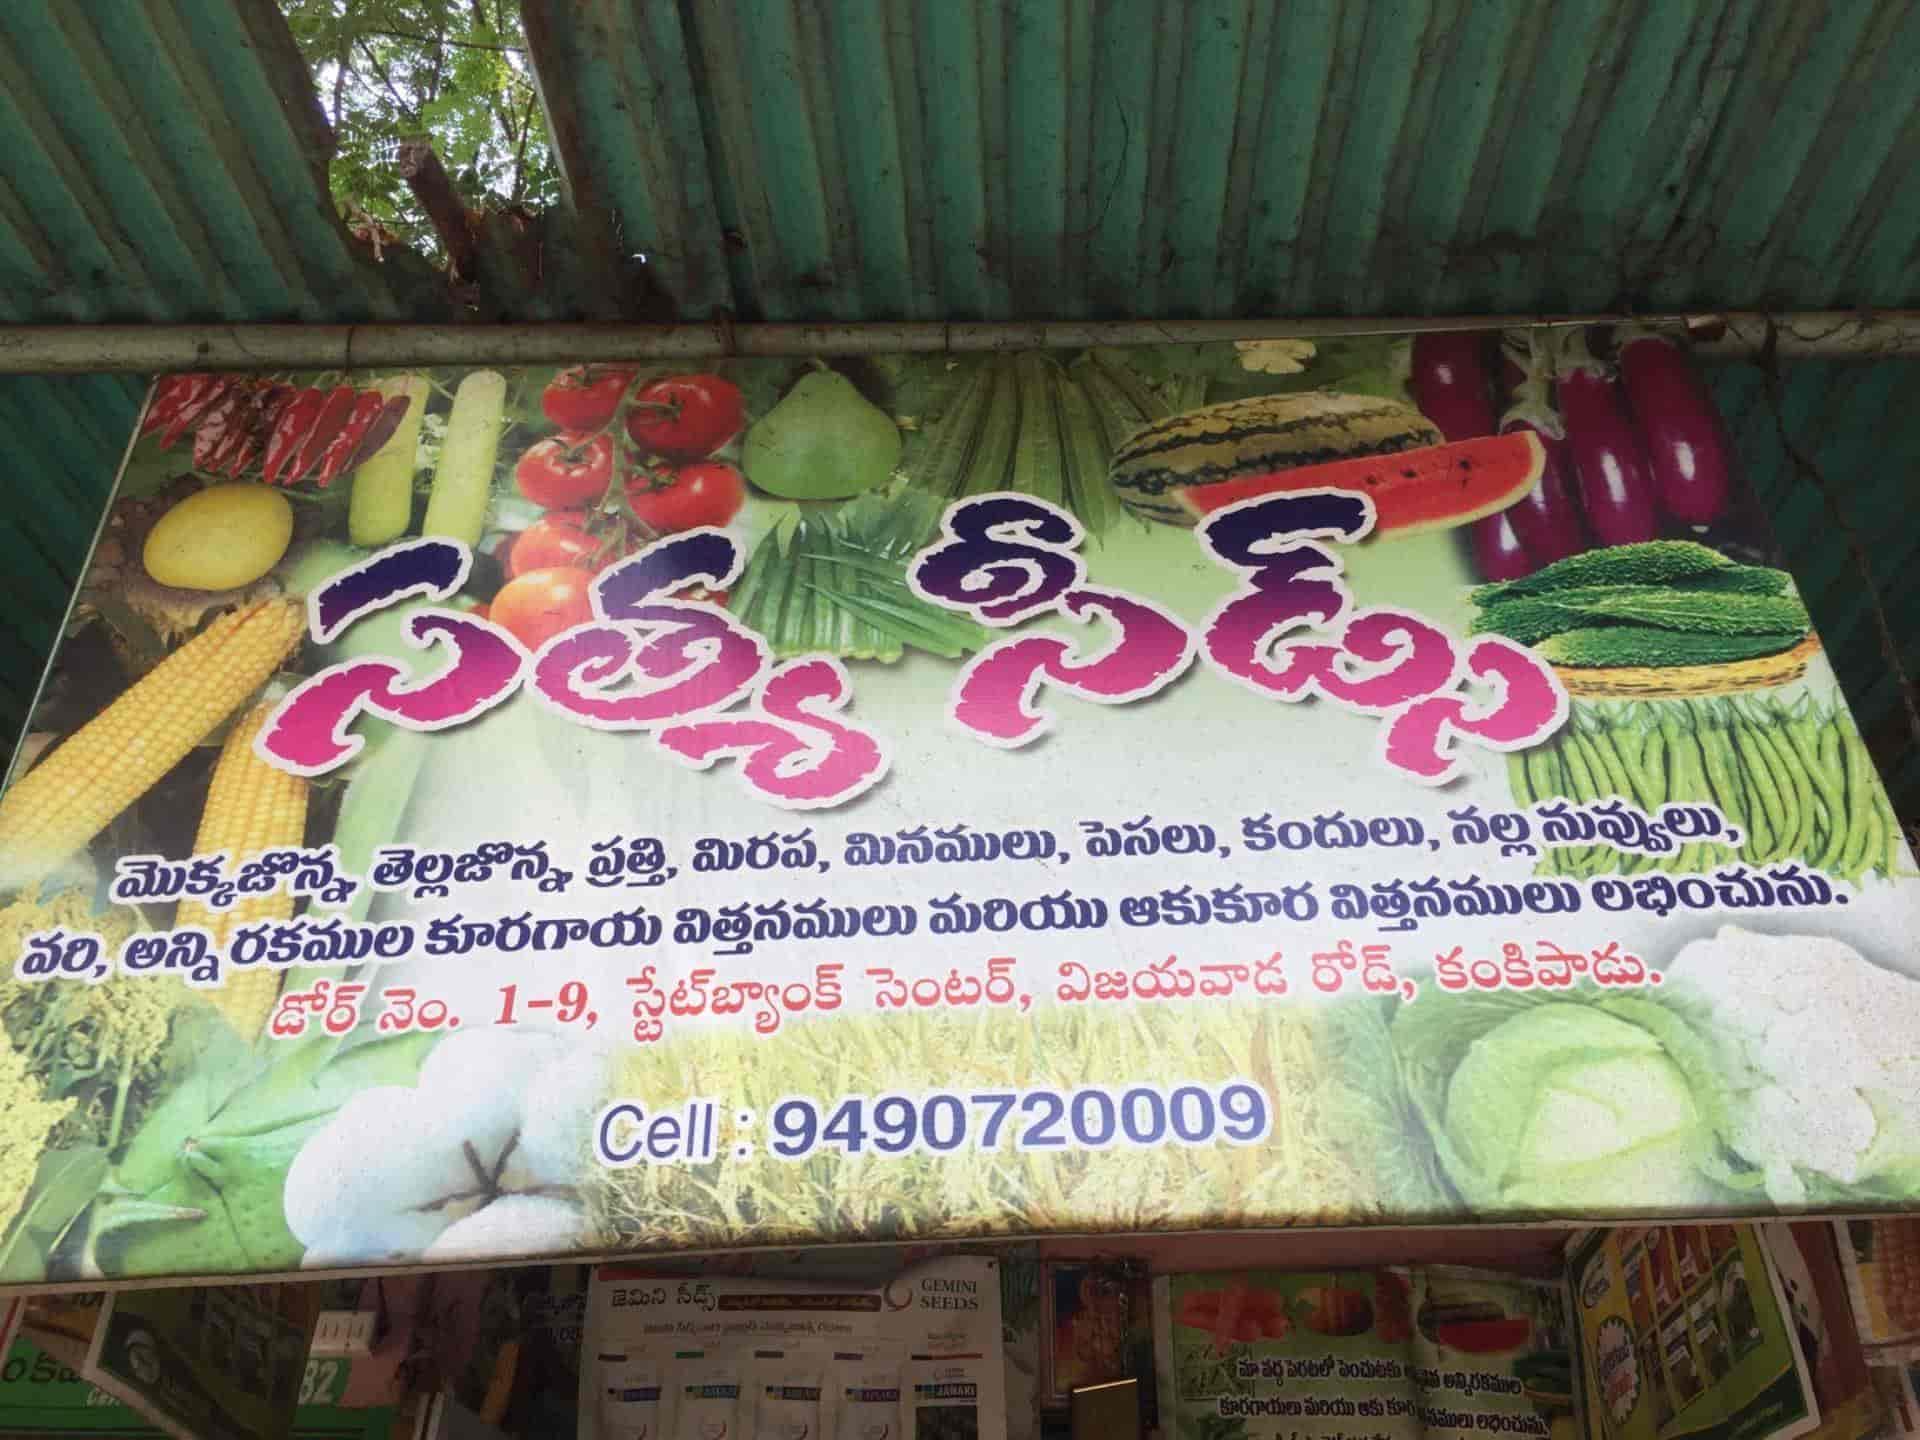 Satya Seeds, Kankipadu - Agriculture Seed Dealers in Krishna